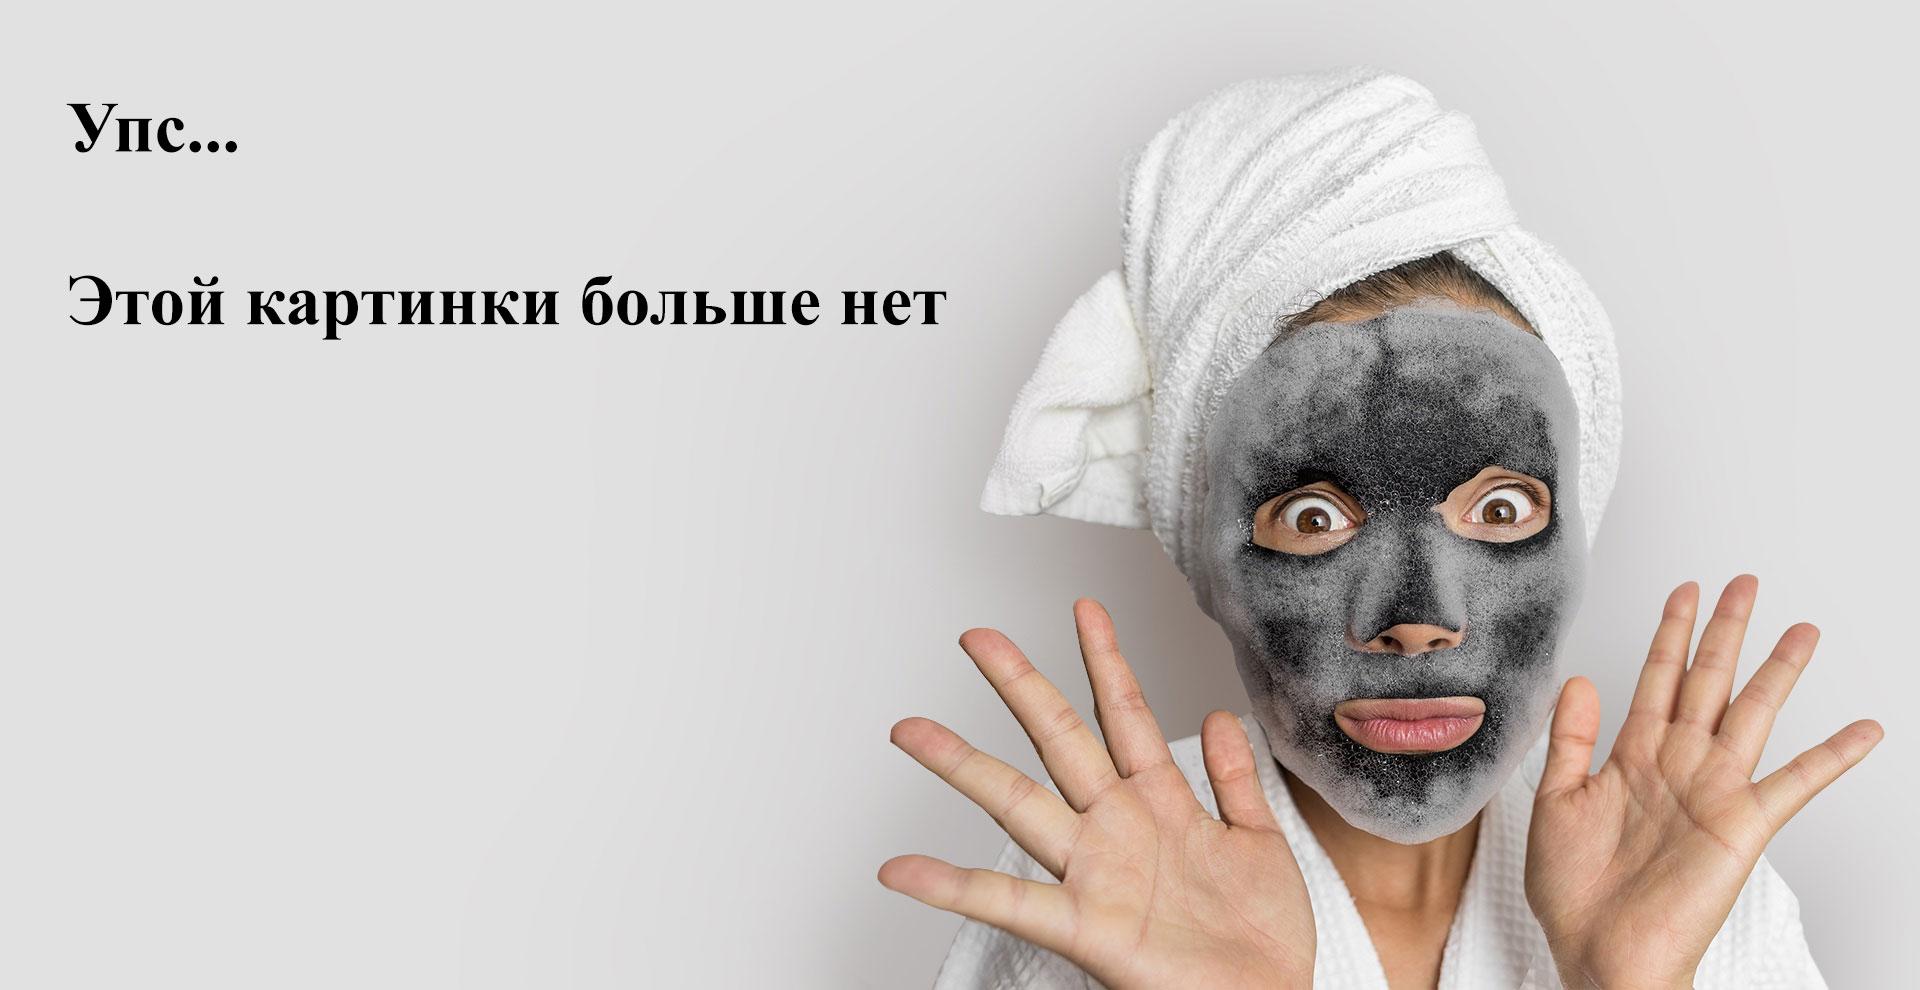 Vichy, Шампунь Dercos Anti-Dandruff Dry Hair, 200 мл